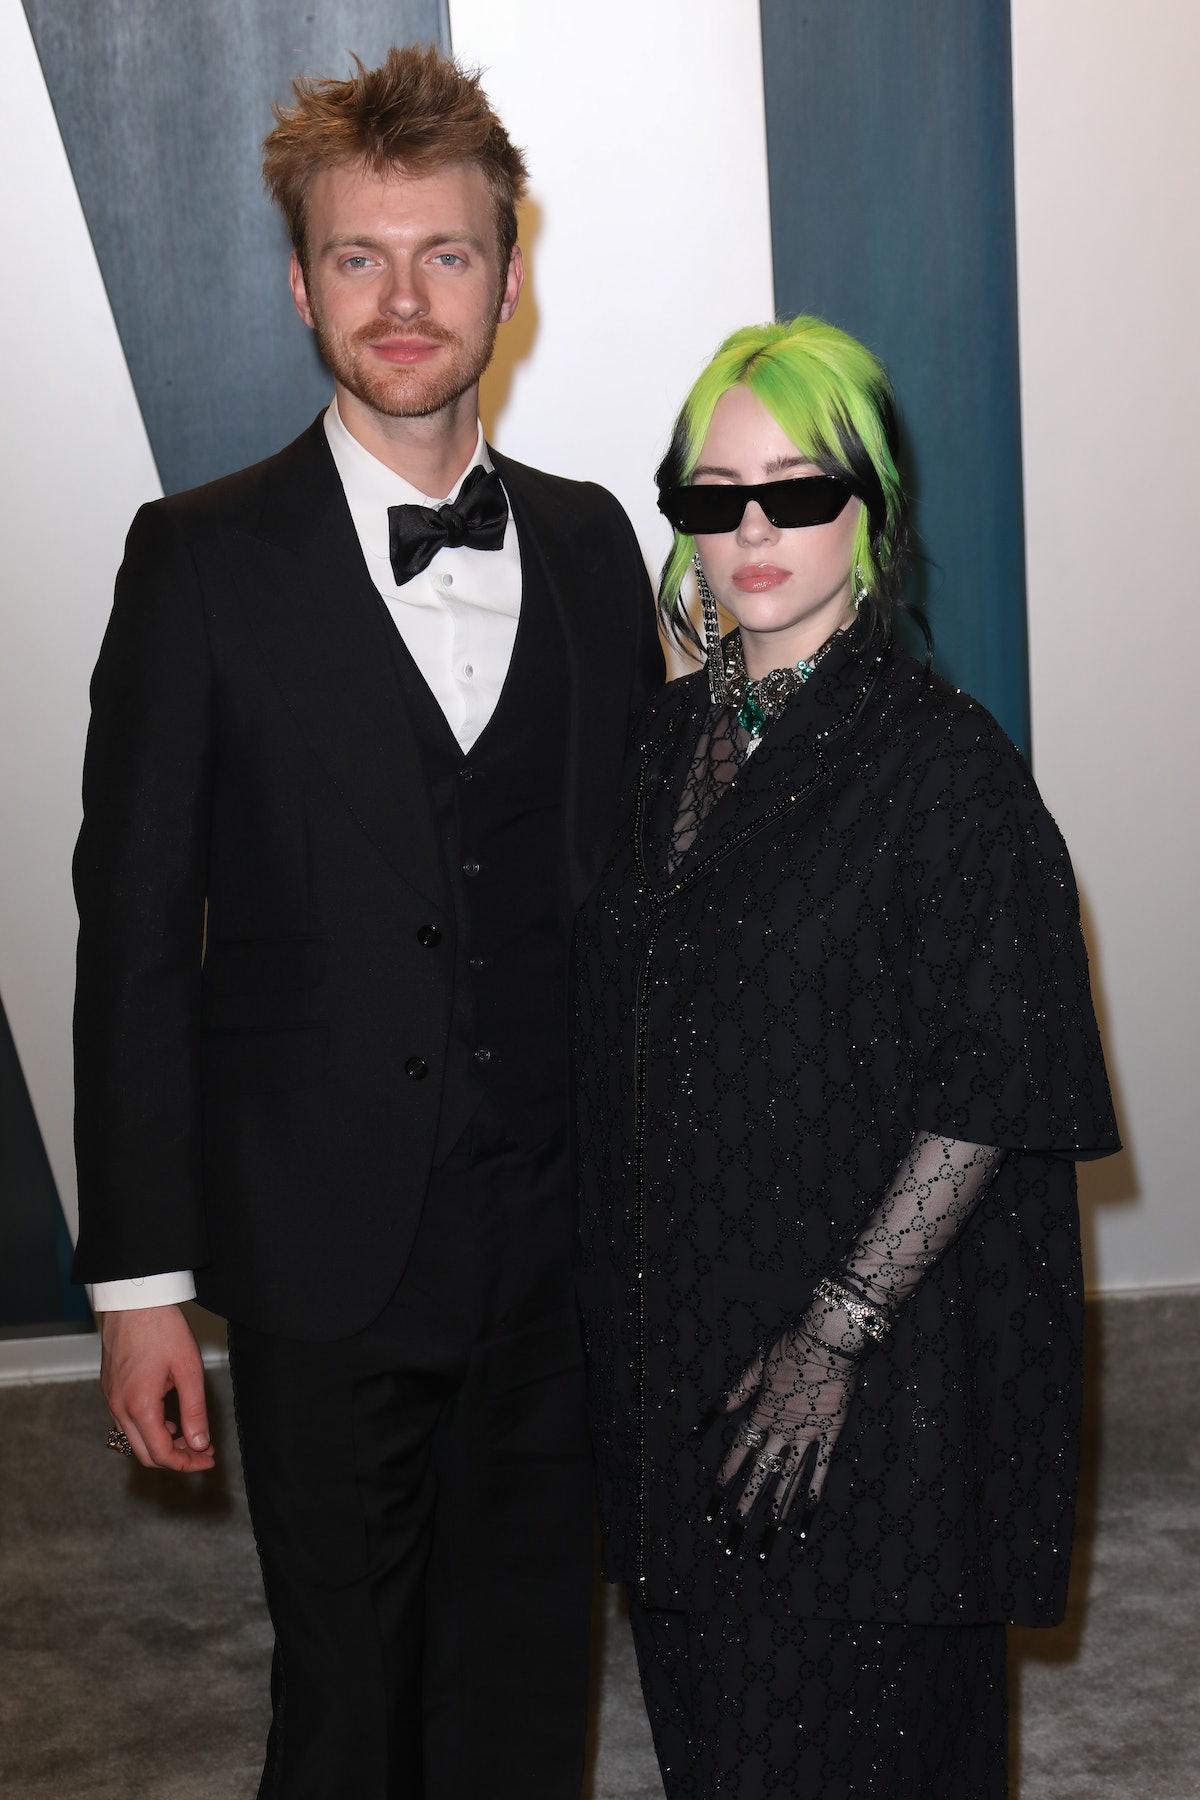 Finneas and Billie Eilish attend a Vanity Fair party.